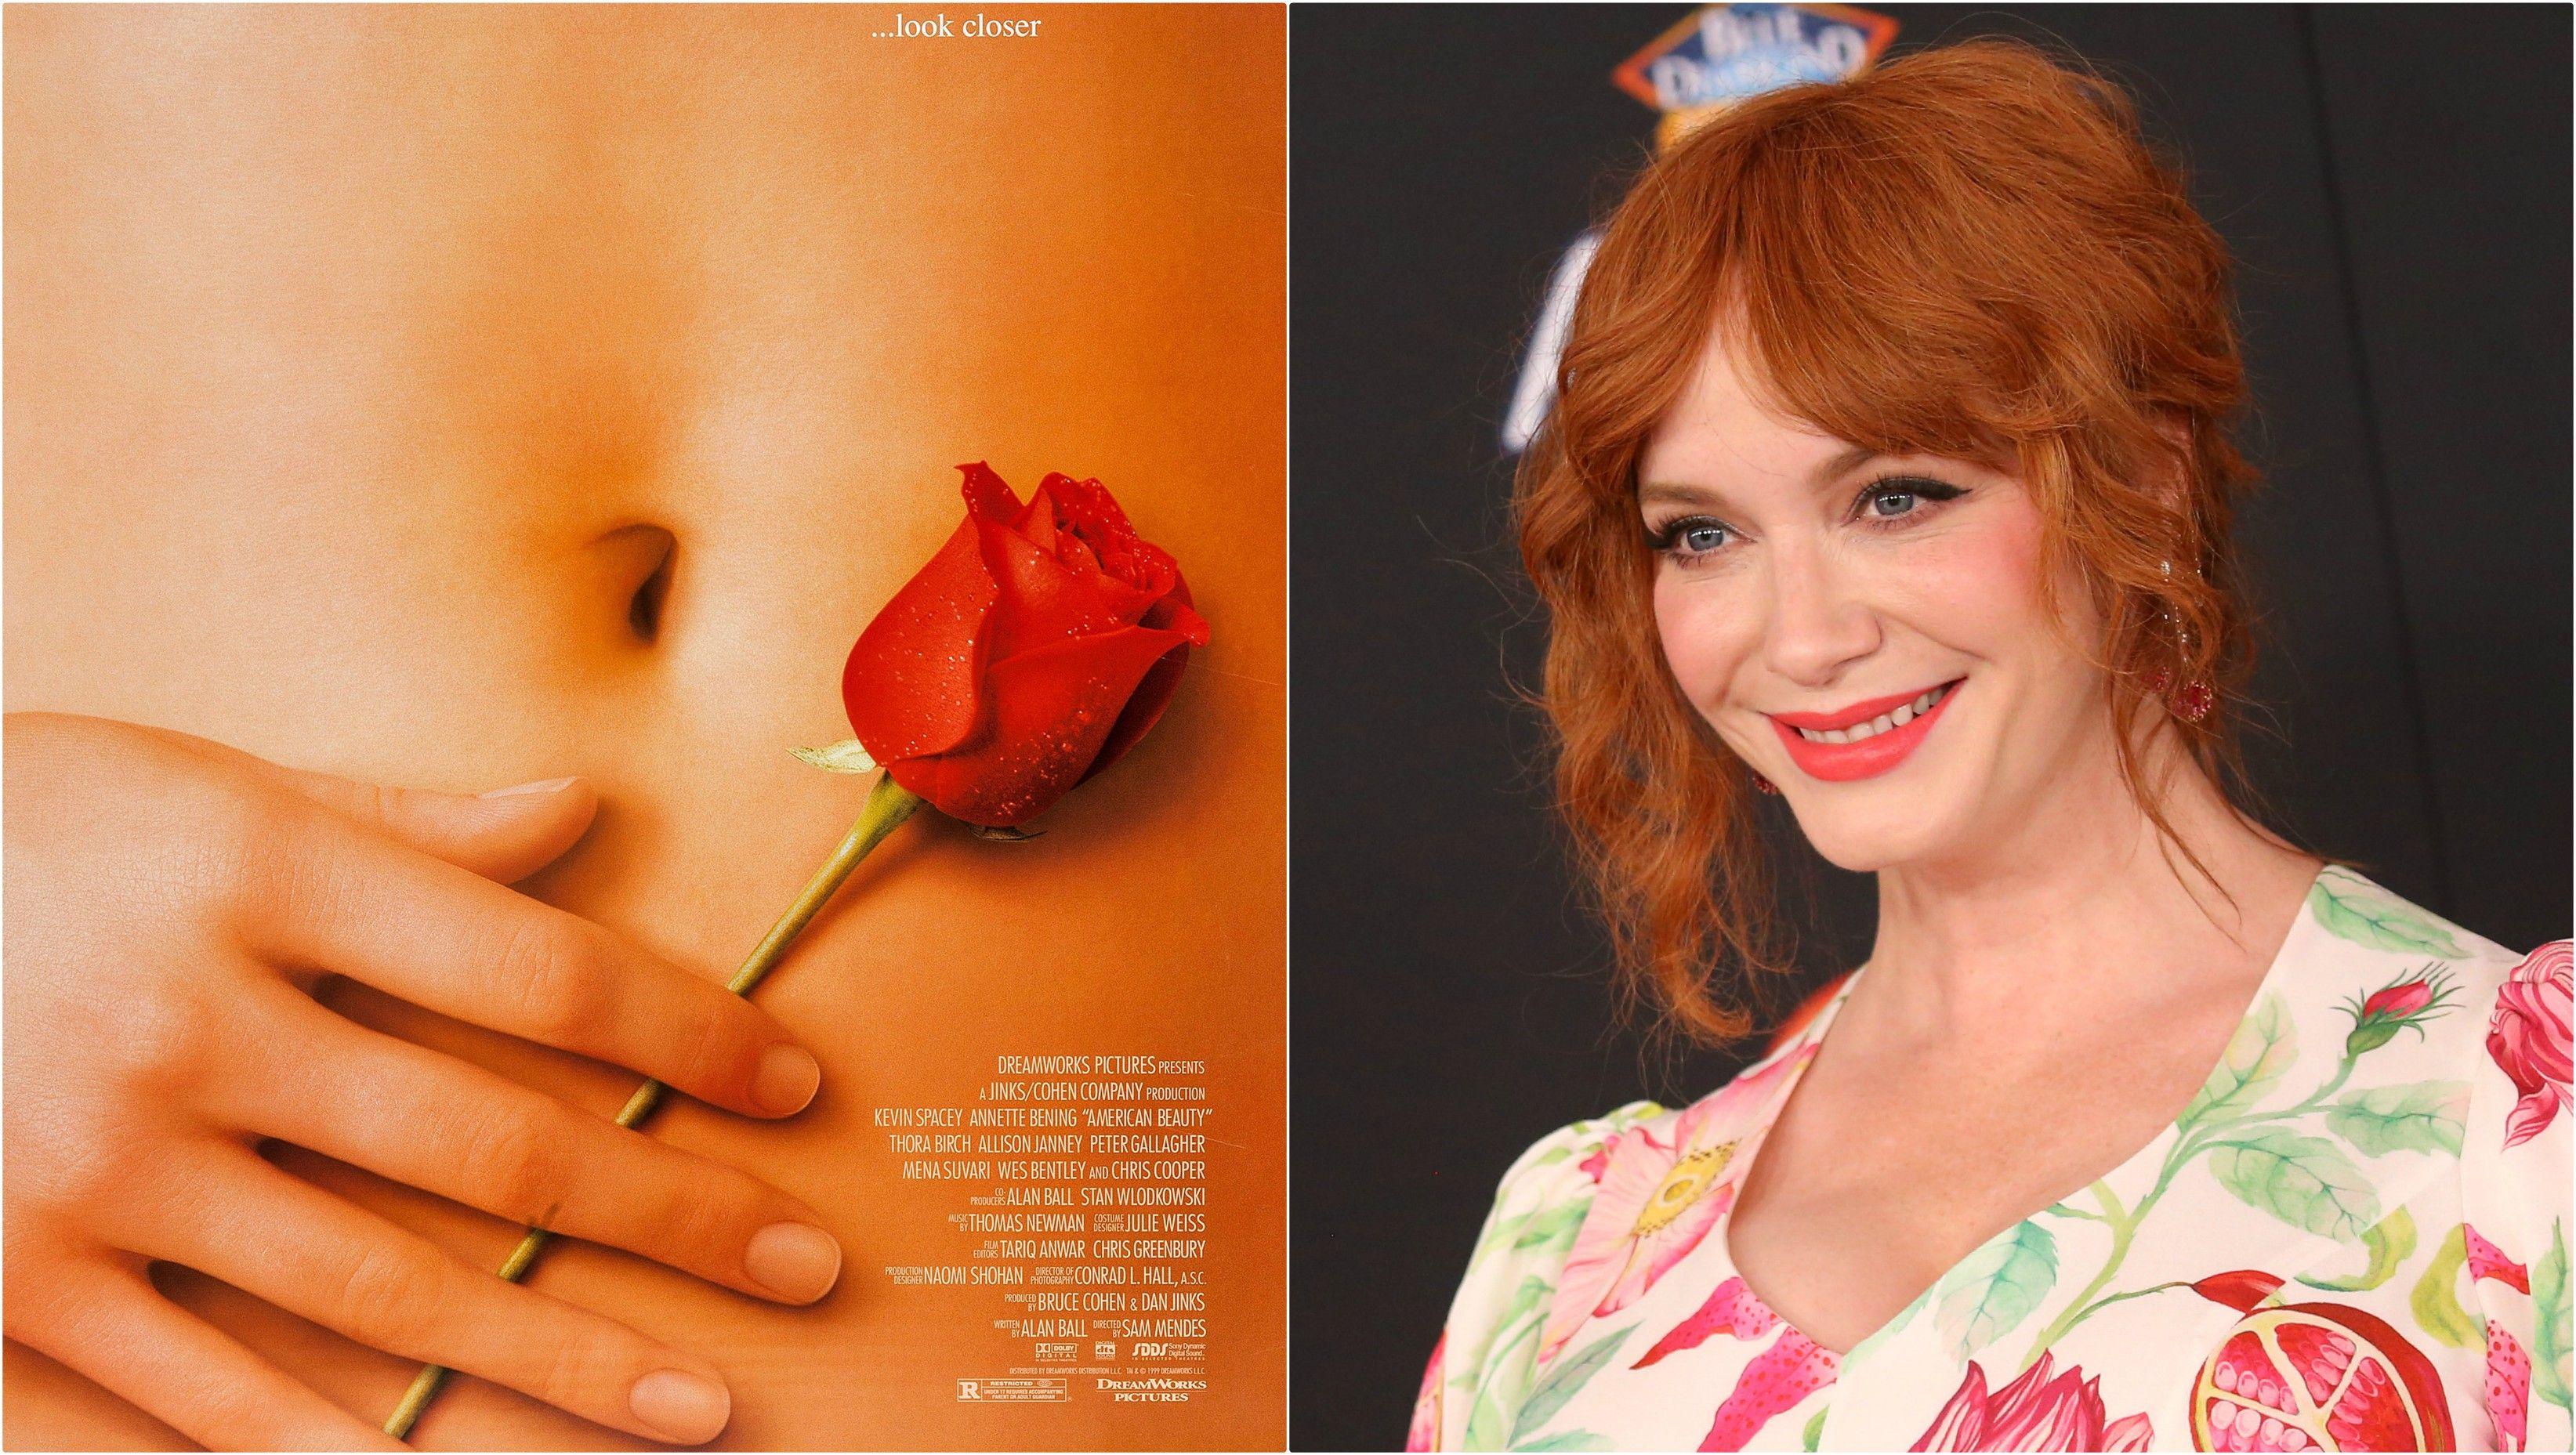 'American Beauty': ¡La mano del póster es Christina Hendricks!